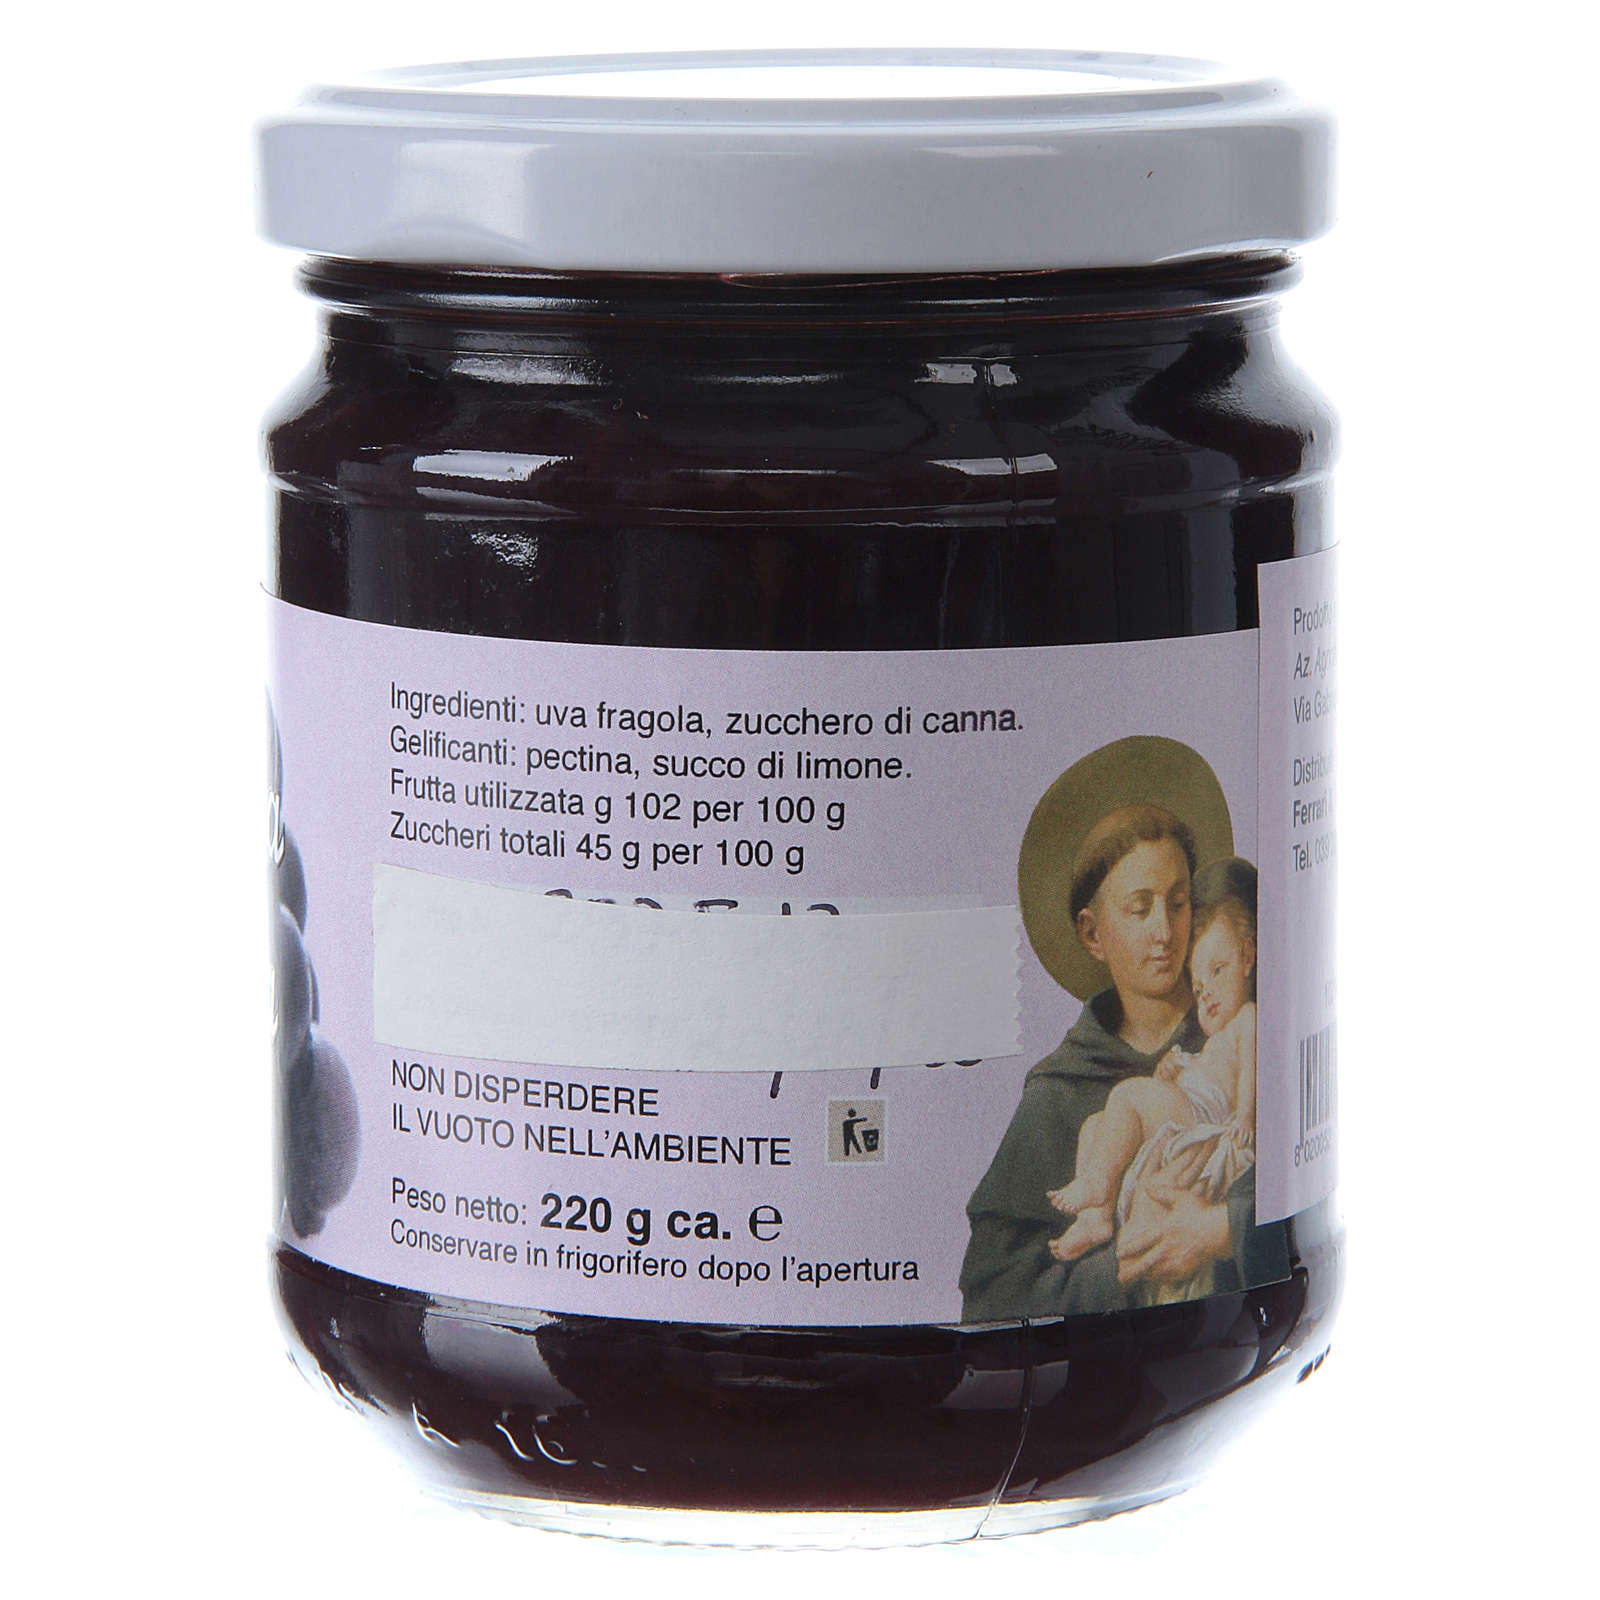 Erdbeertrauben-Konfitüre 220 Gramm Sant'Antonio di Padova 3